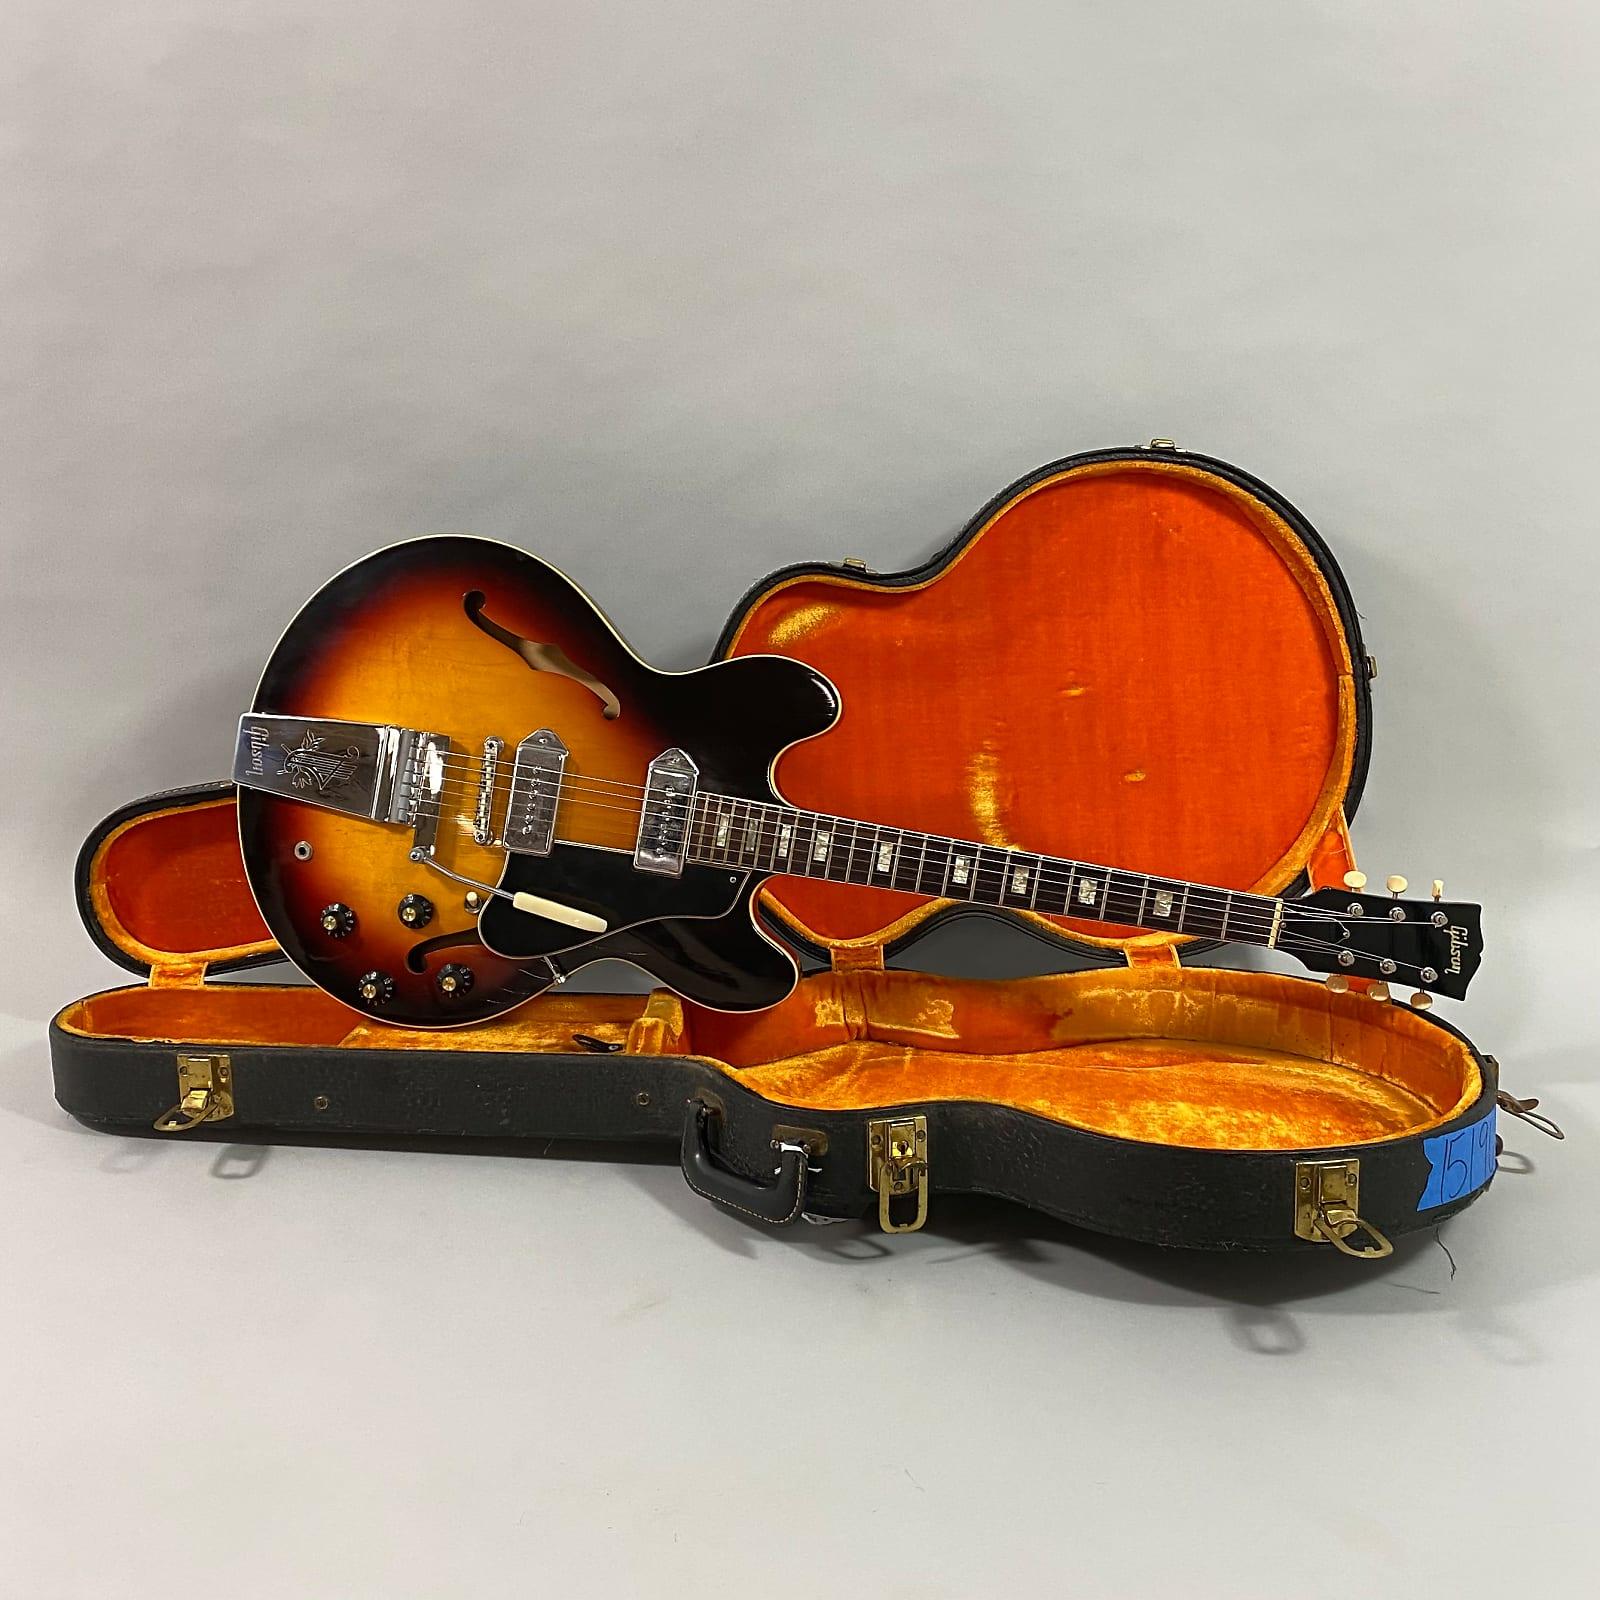 1967 Gibson ES-330 W/ Vibrola